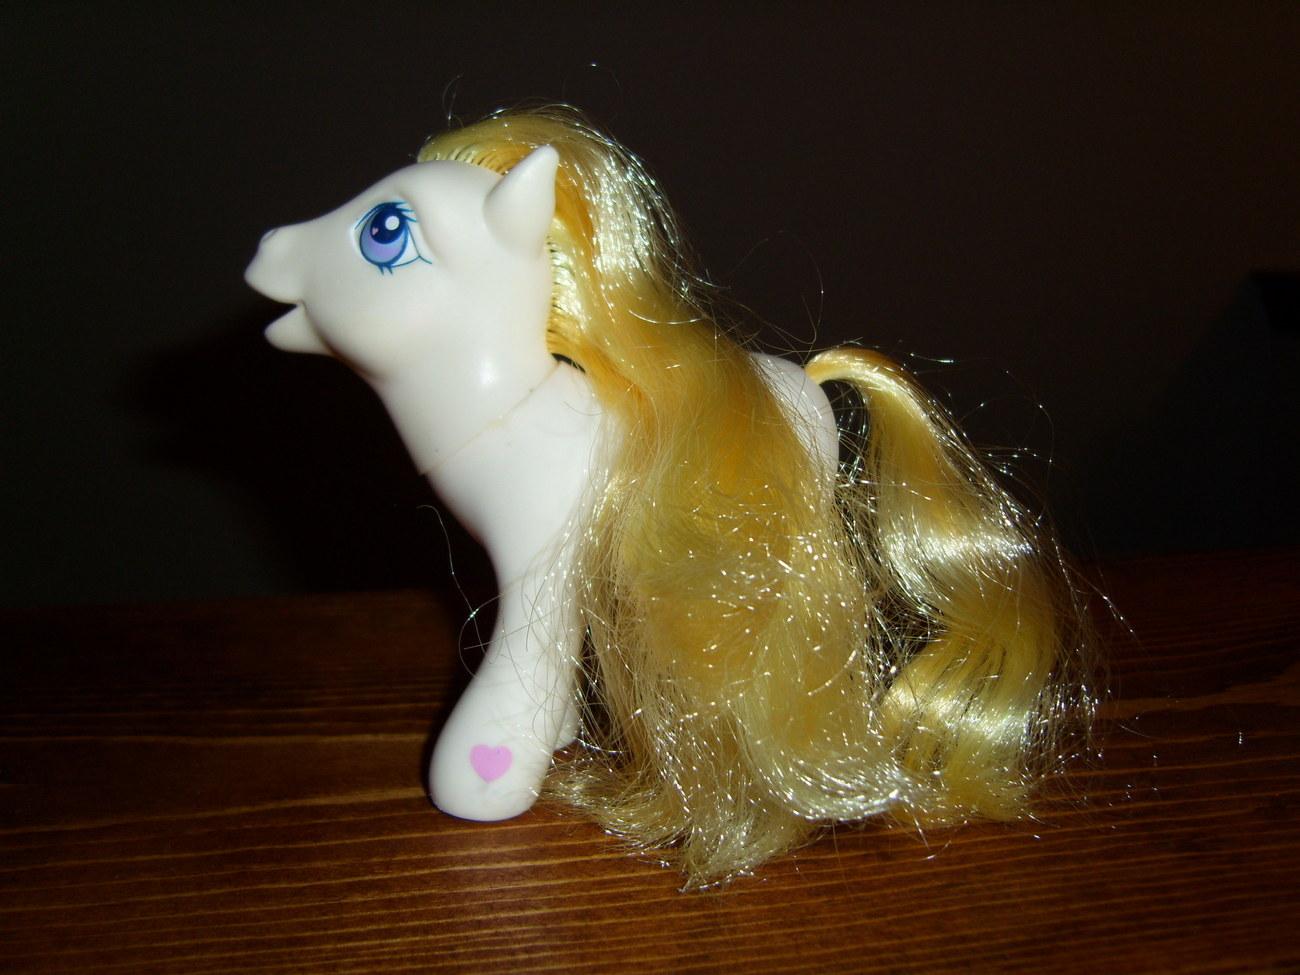 My Little Pony G3 Flutter Butter